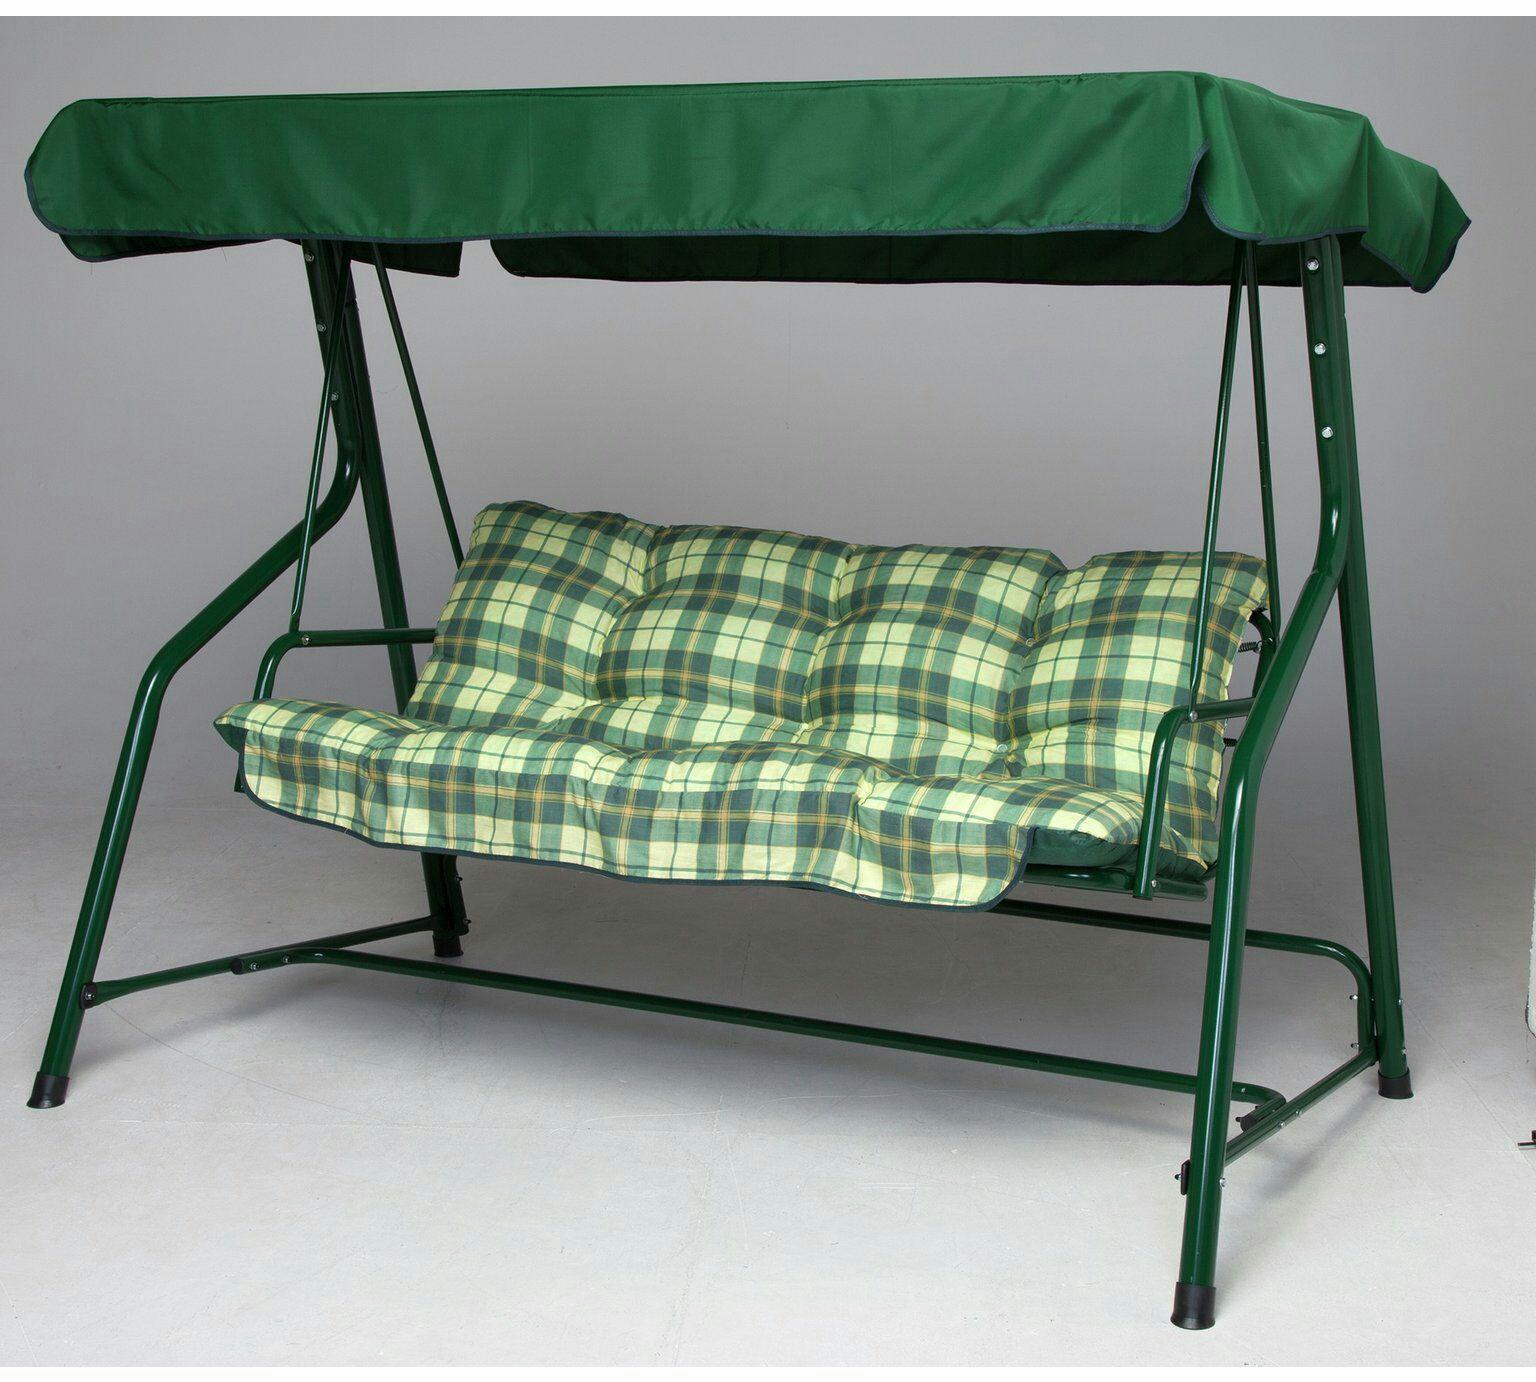 Three Seater Garden Swing/Hammock with Cushions - £99.99 @ Argos